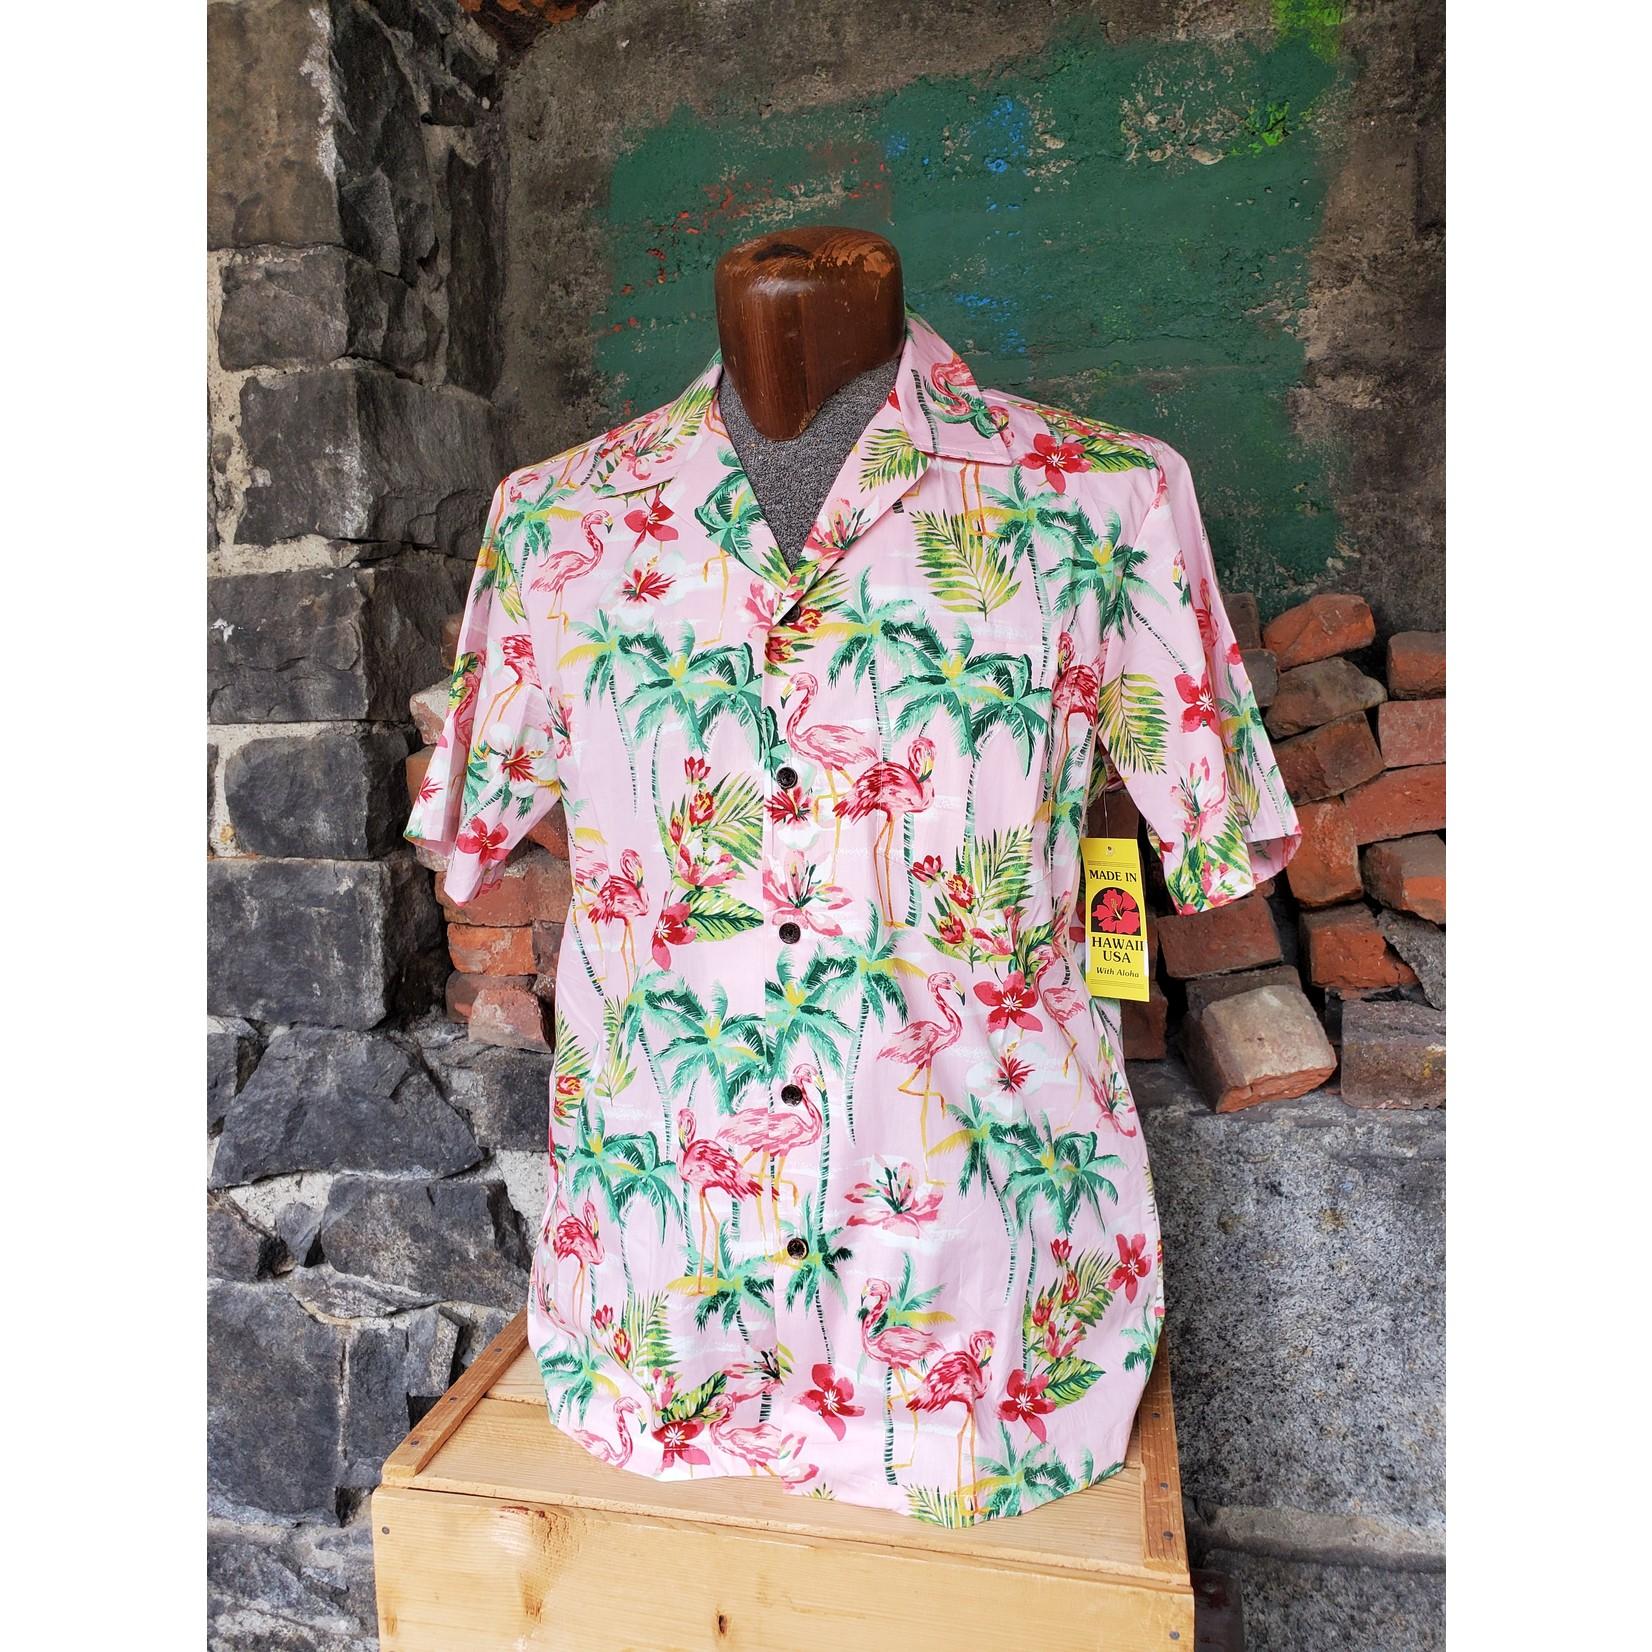 RJC Authentic Hawaiian Shirt - Pink Flamingo Floral